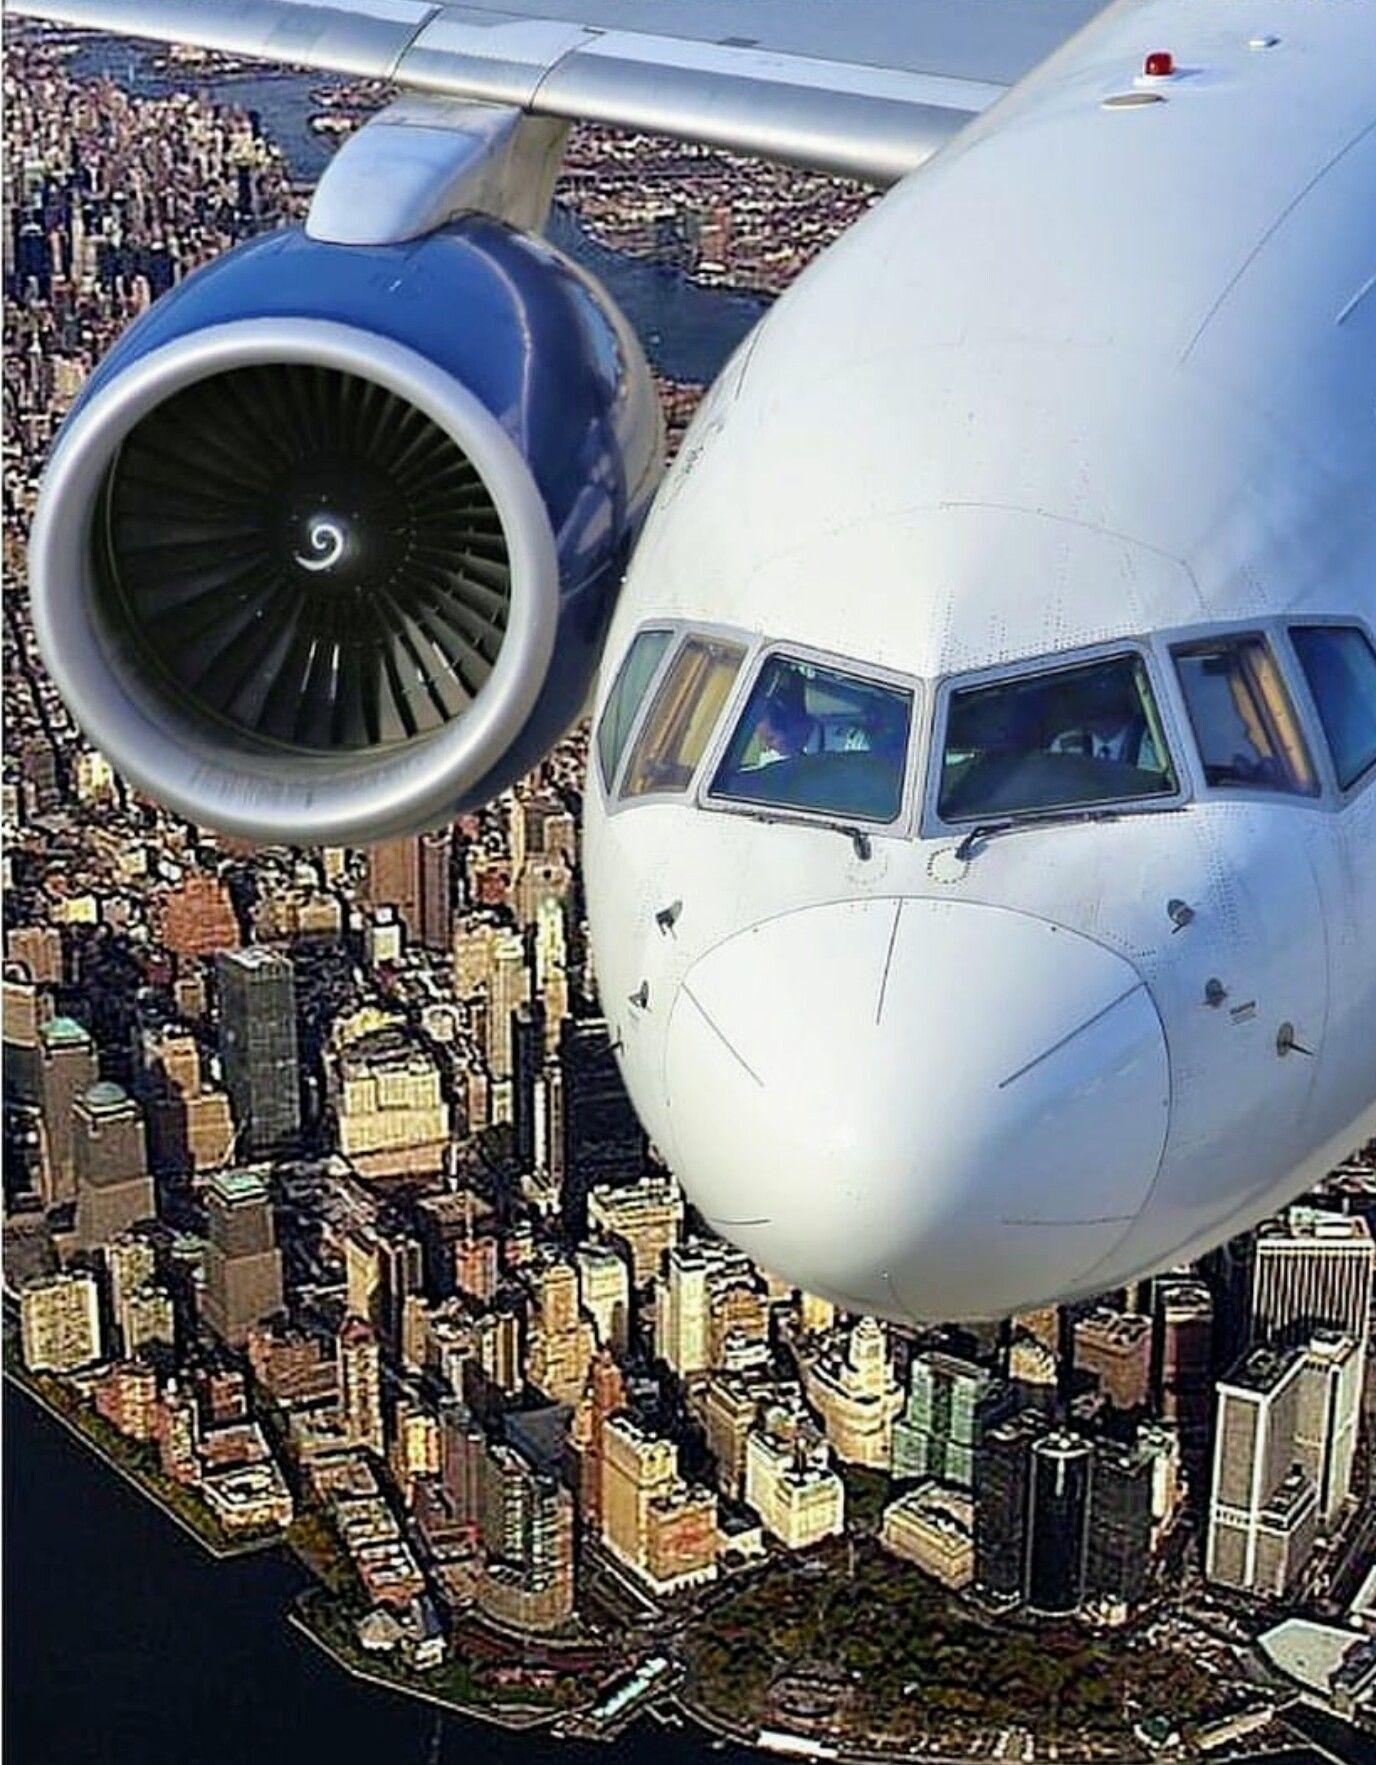 757 Over Nyc Aircraft Aviation Civil Aviation